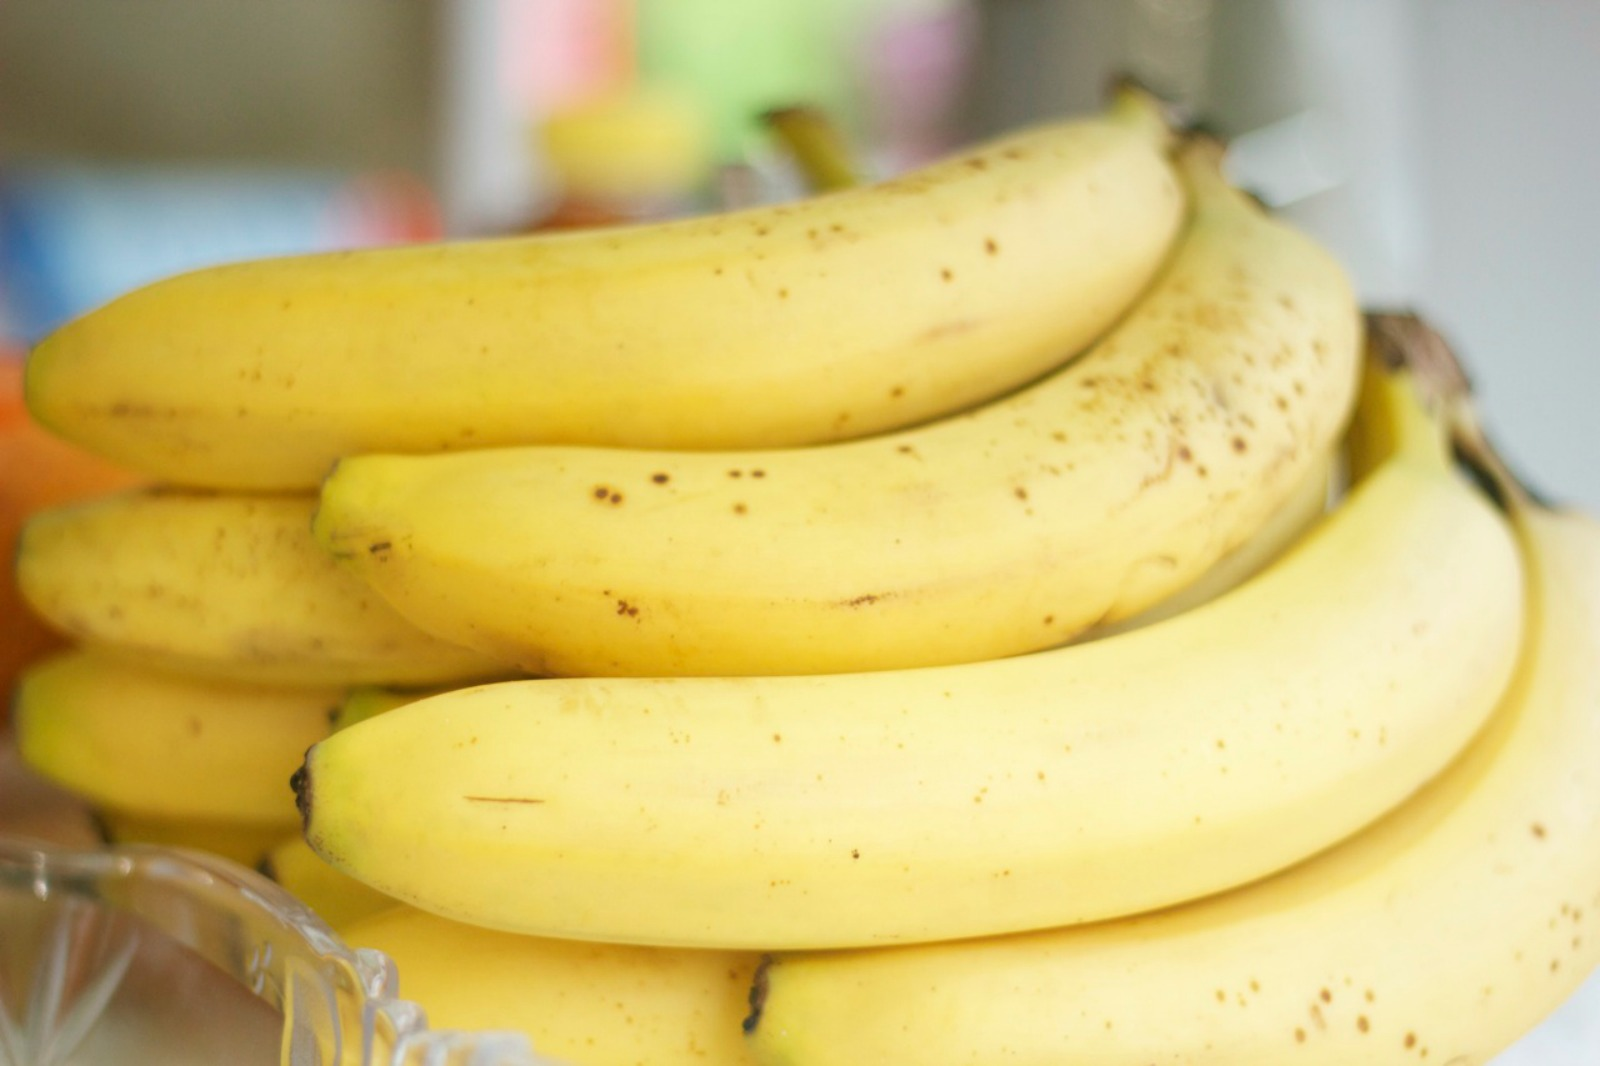 digestion friendly bananas